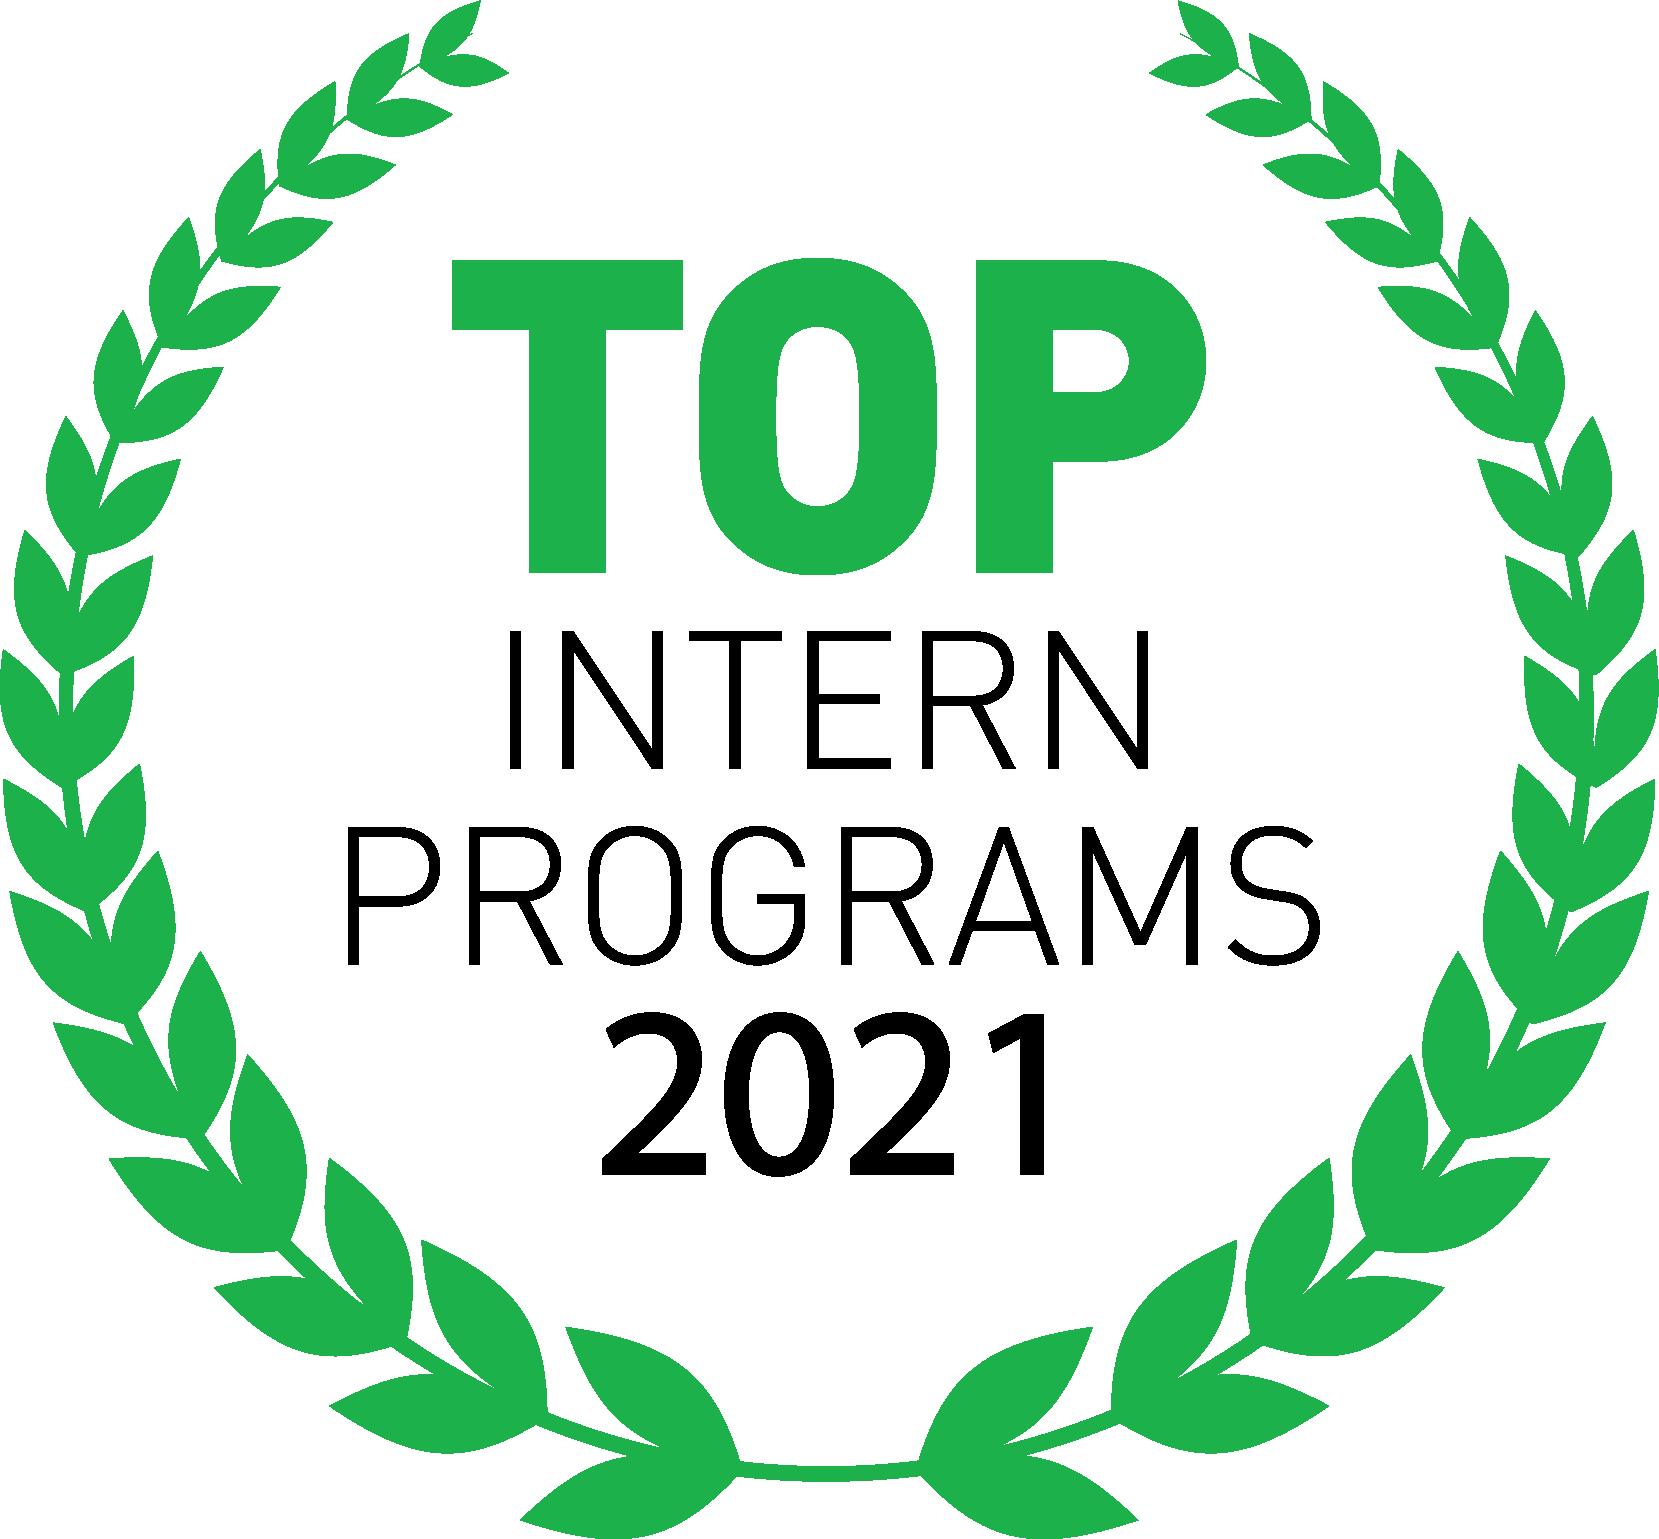 Top Intern Programs 2021